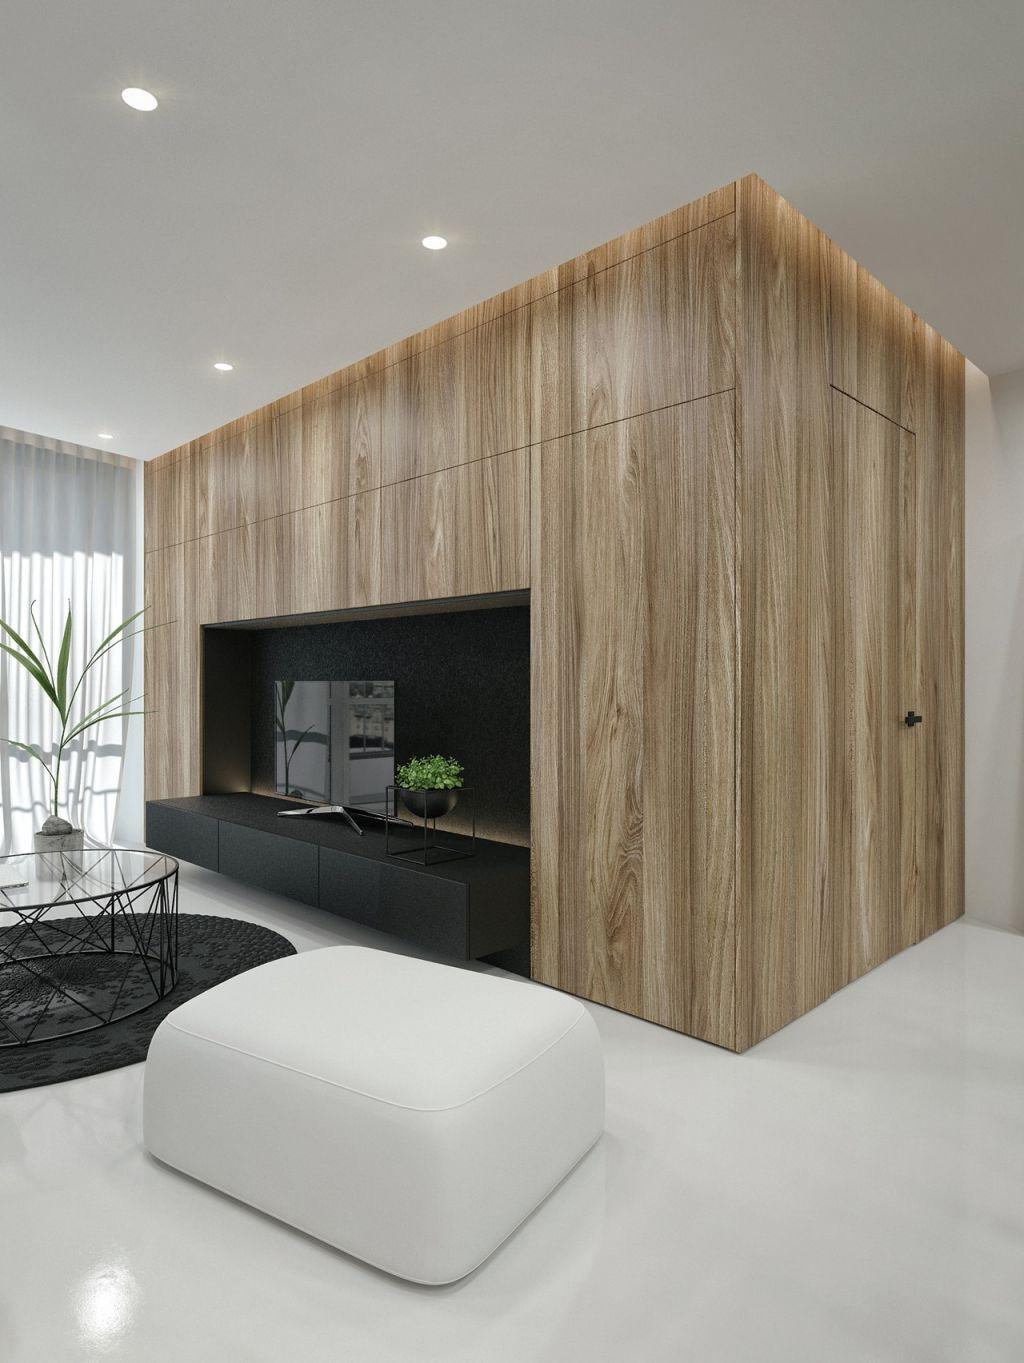 Black And White Interior Design Ideas: Modern Apartmentid White intended for Contemporary Interior Design Ideas